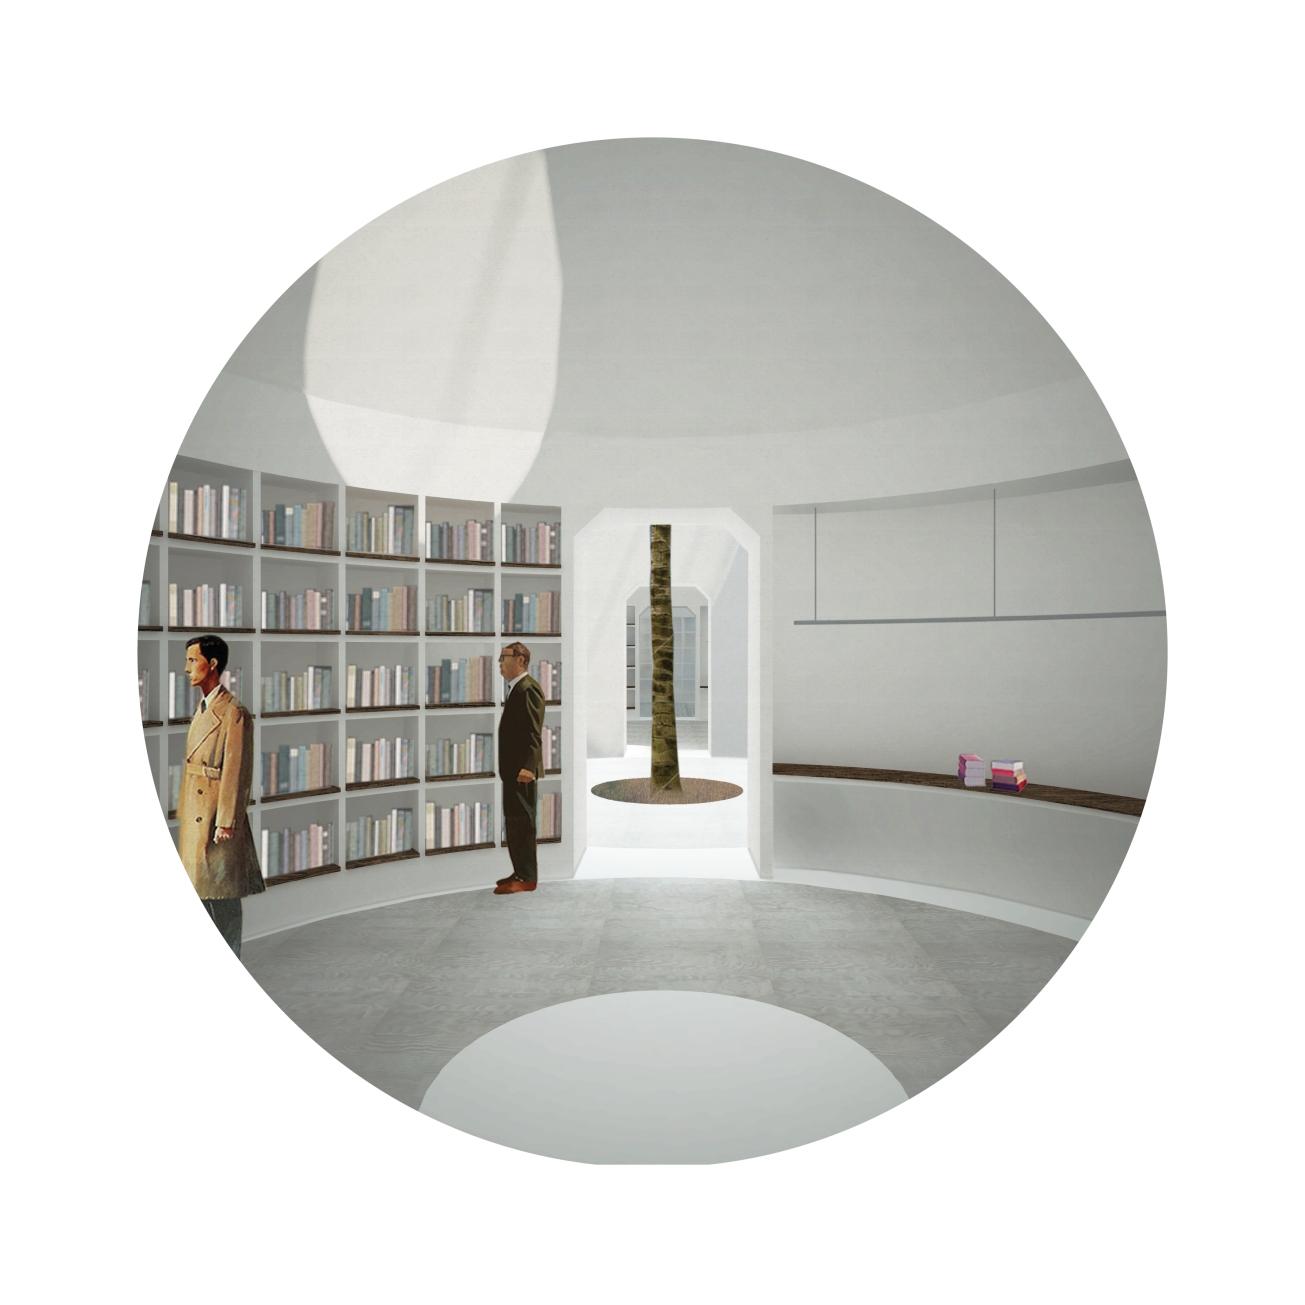 Library View2,Pierluigi Bardi Benedetta De Mitri, Academic